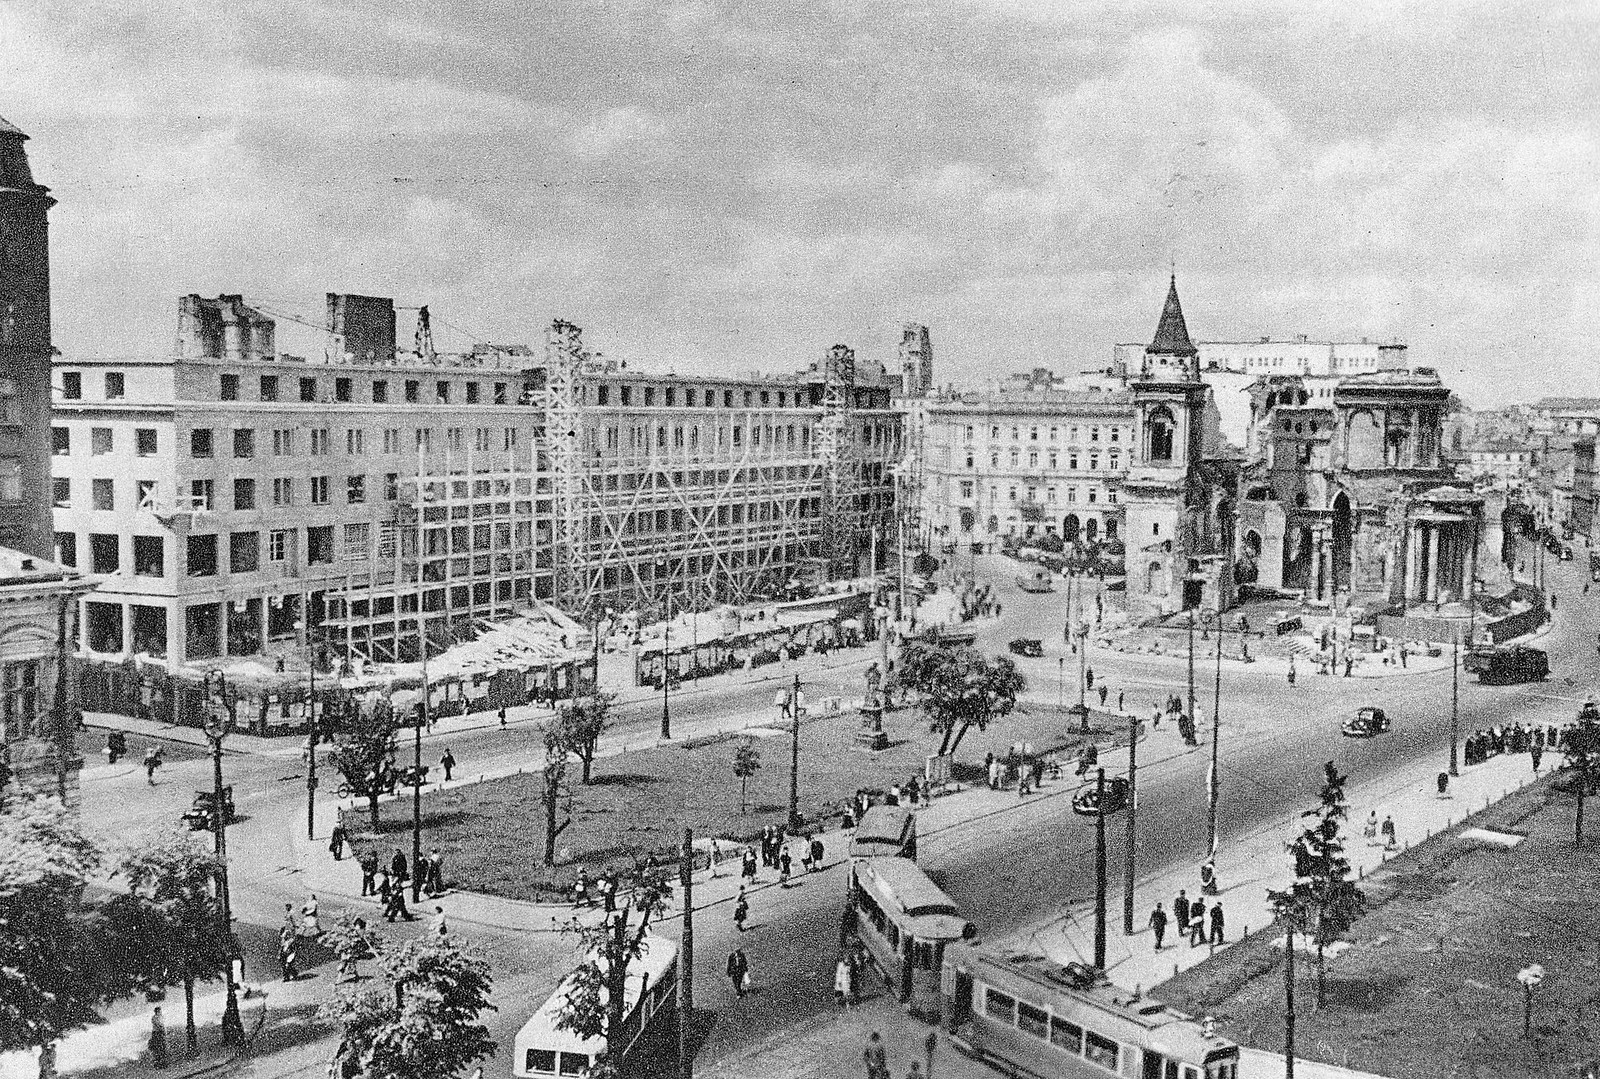 1948-1949 год. Варшава. Площадь Трёх Крестов. Костел Св. Александра.